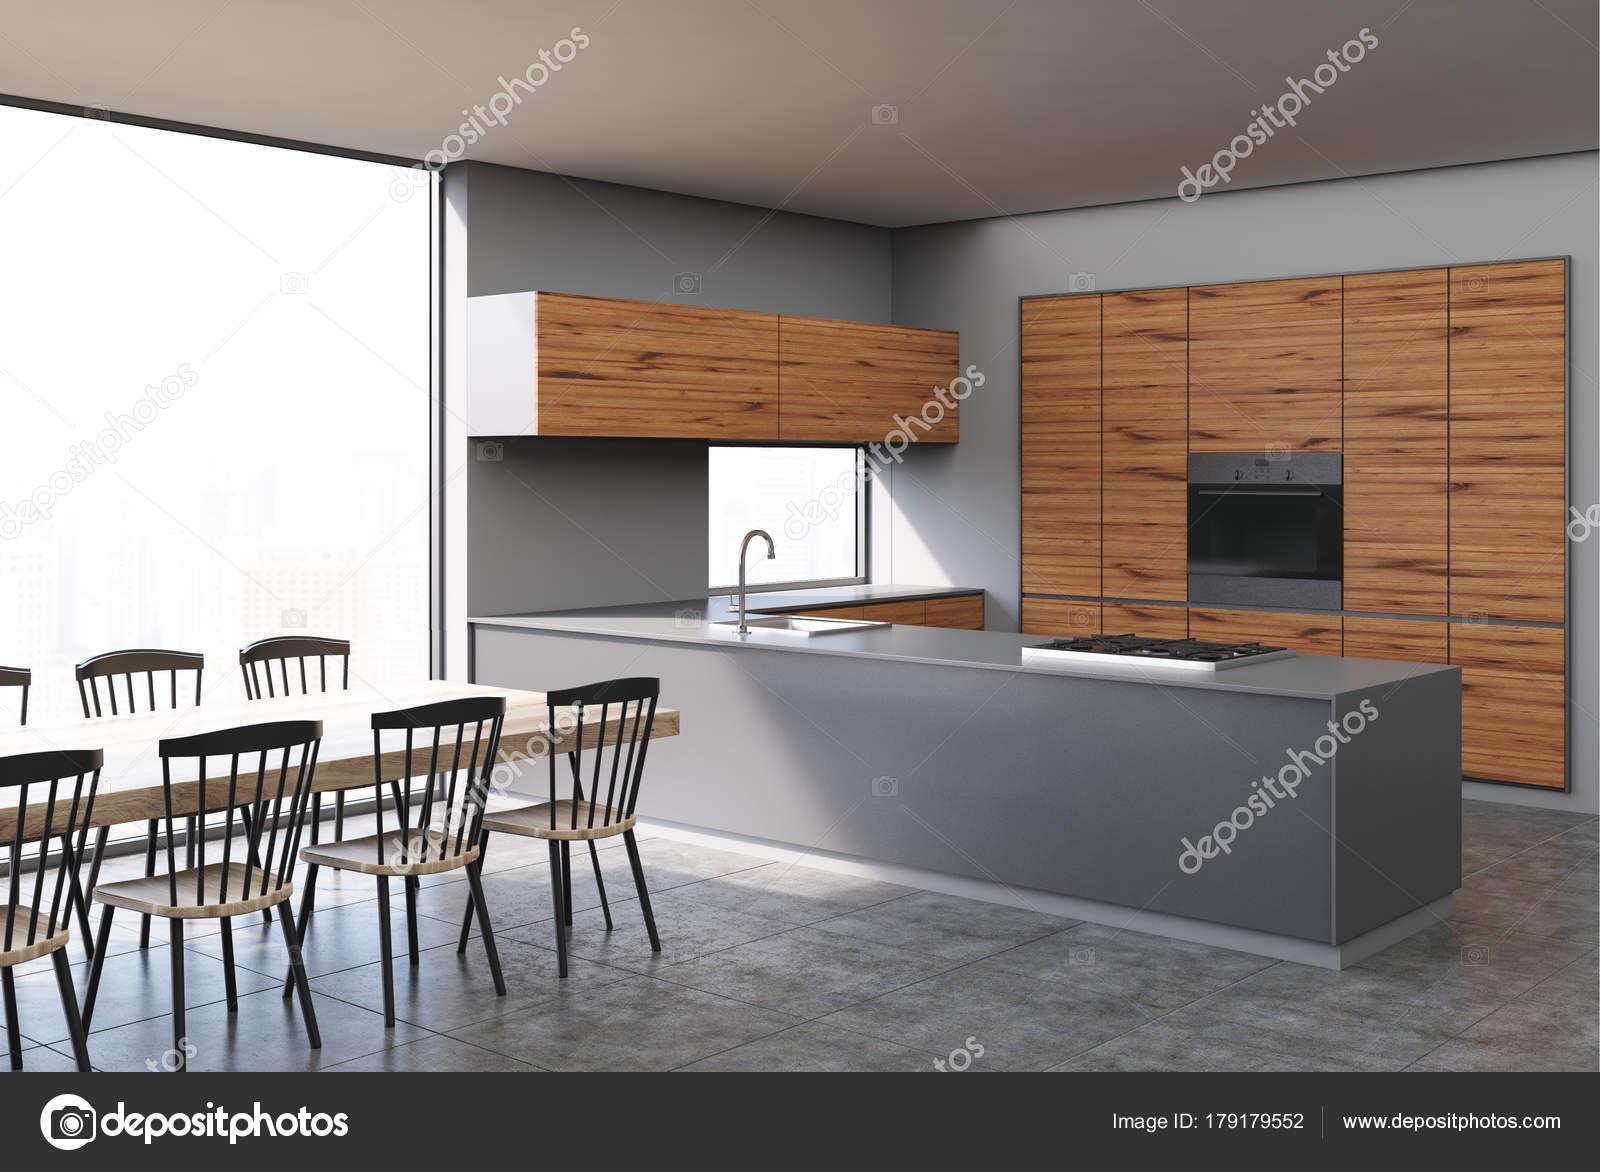 Cocina madera gris y oscuro foto de stock for Cocina de madera gris oscuro